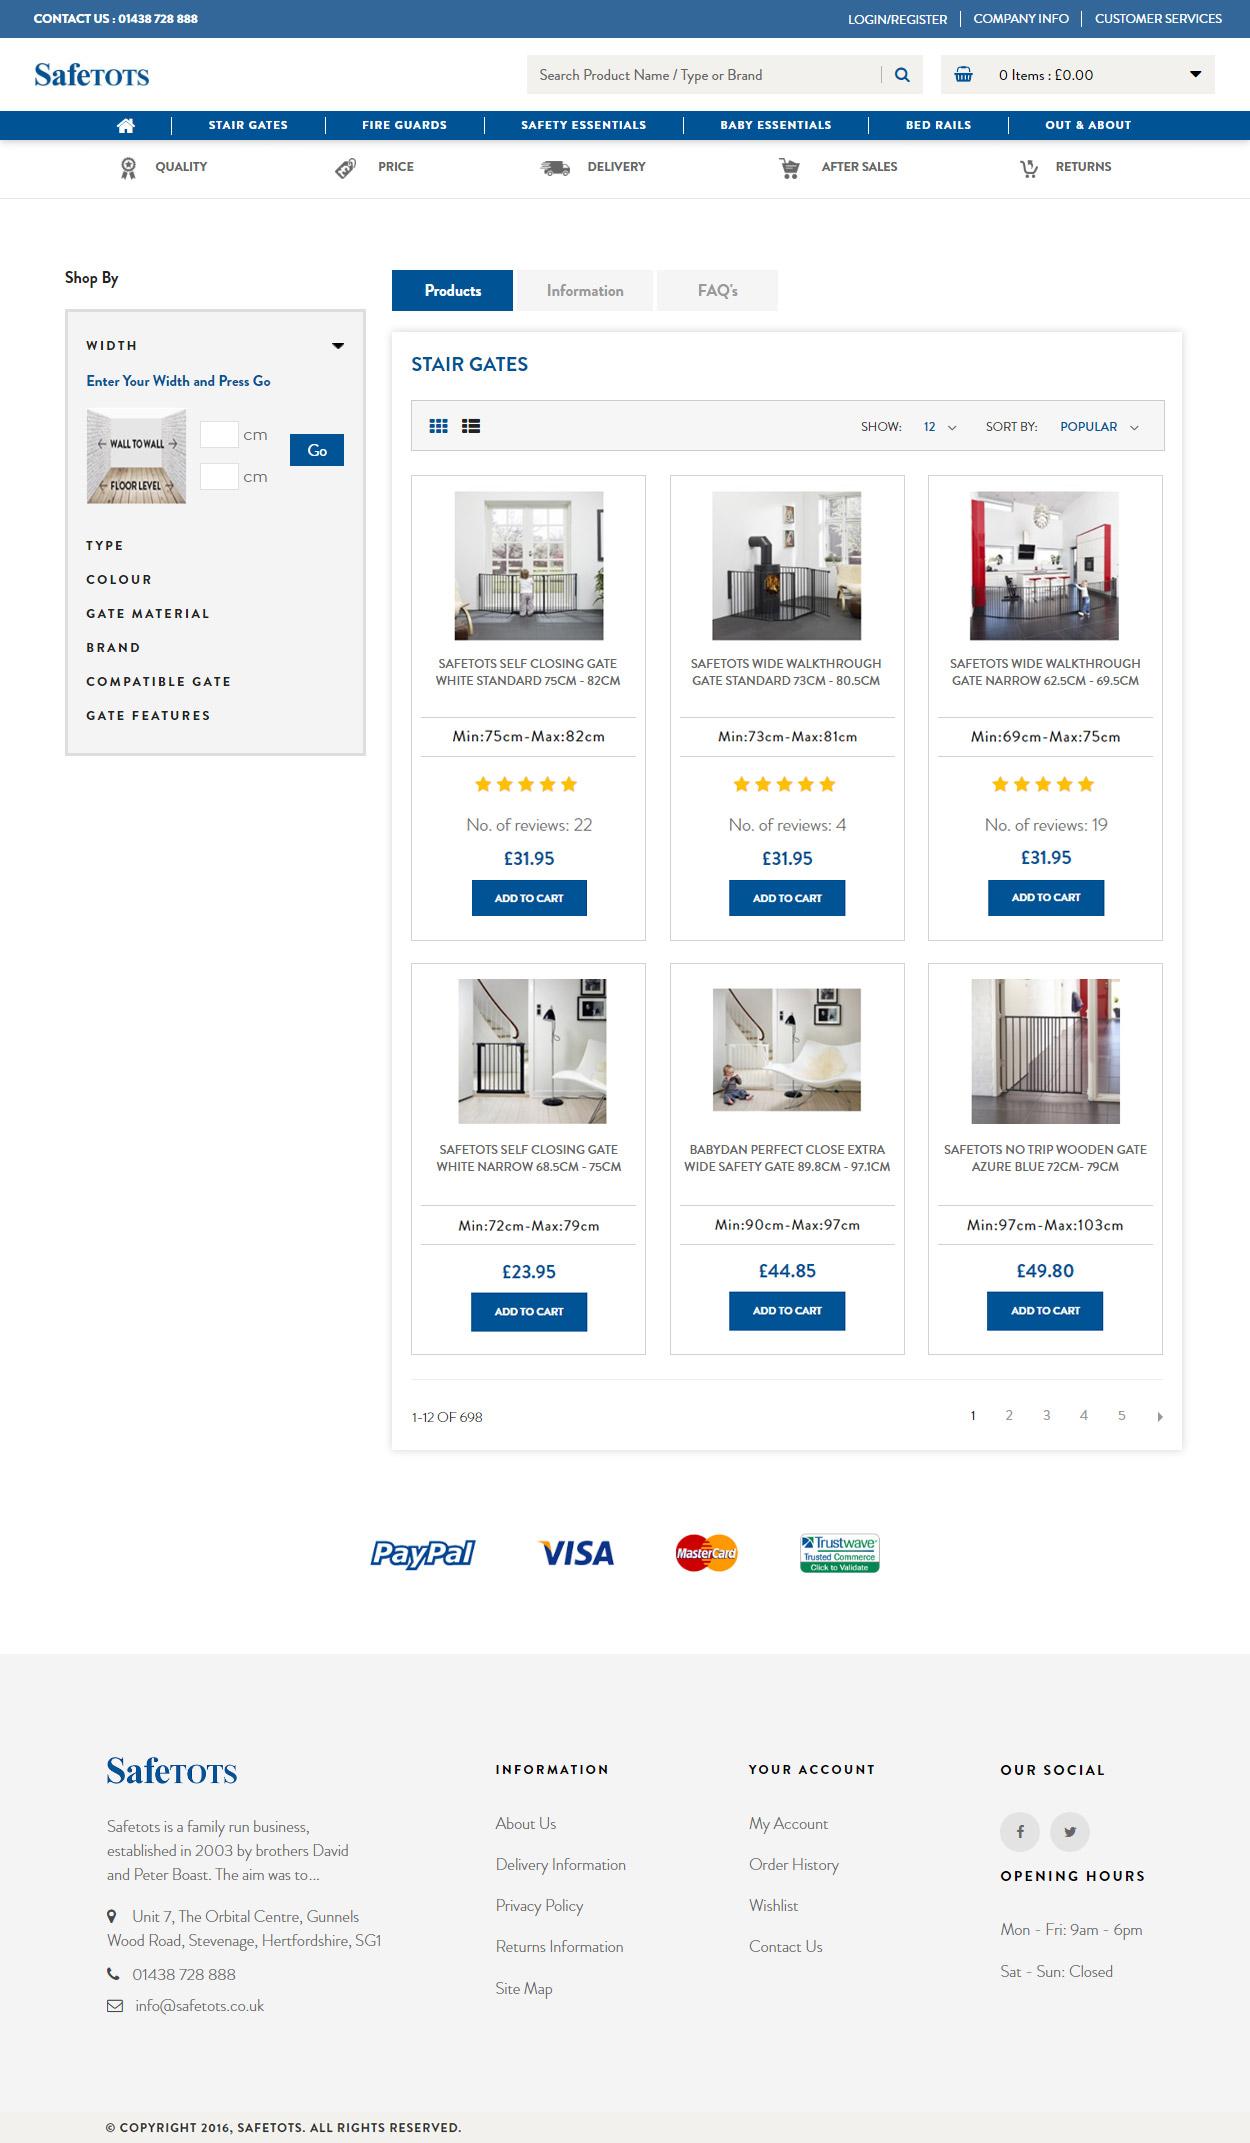 portfolio-detail-safetots-03